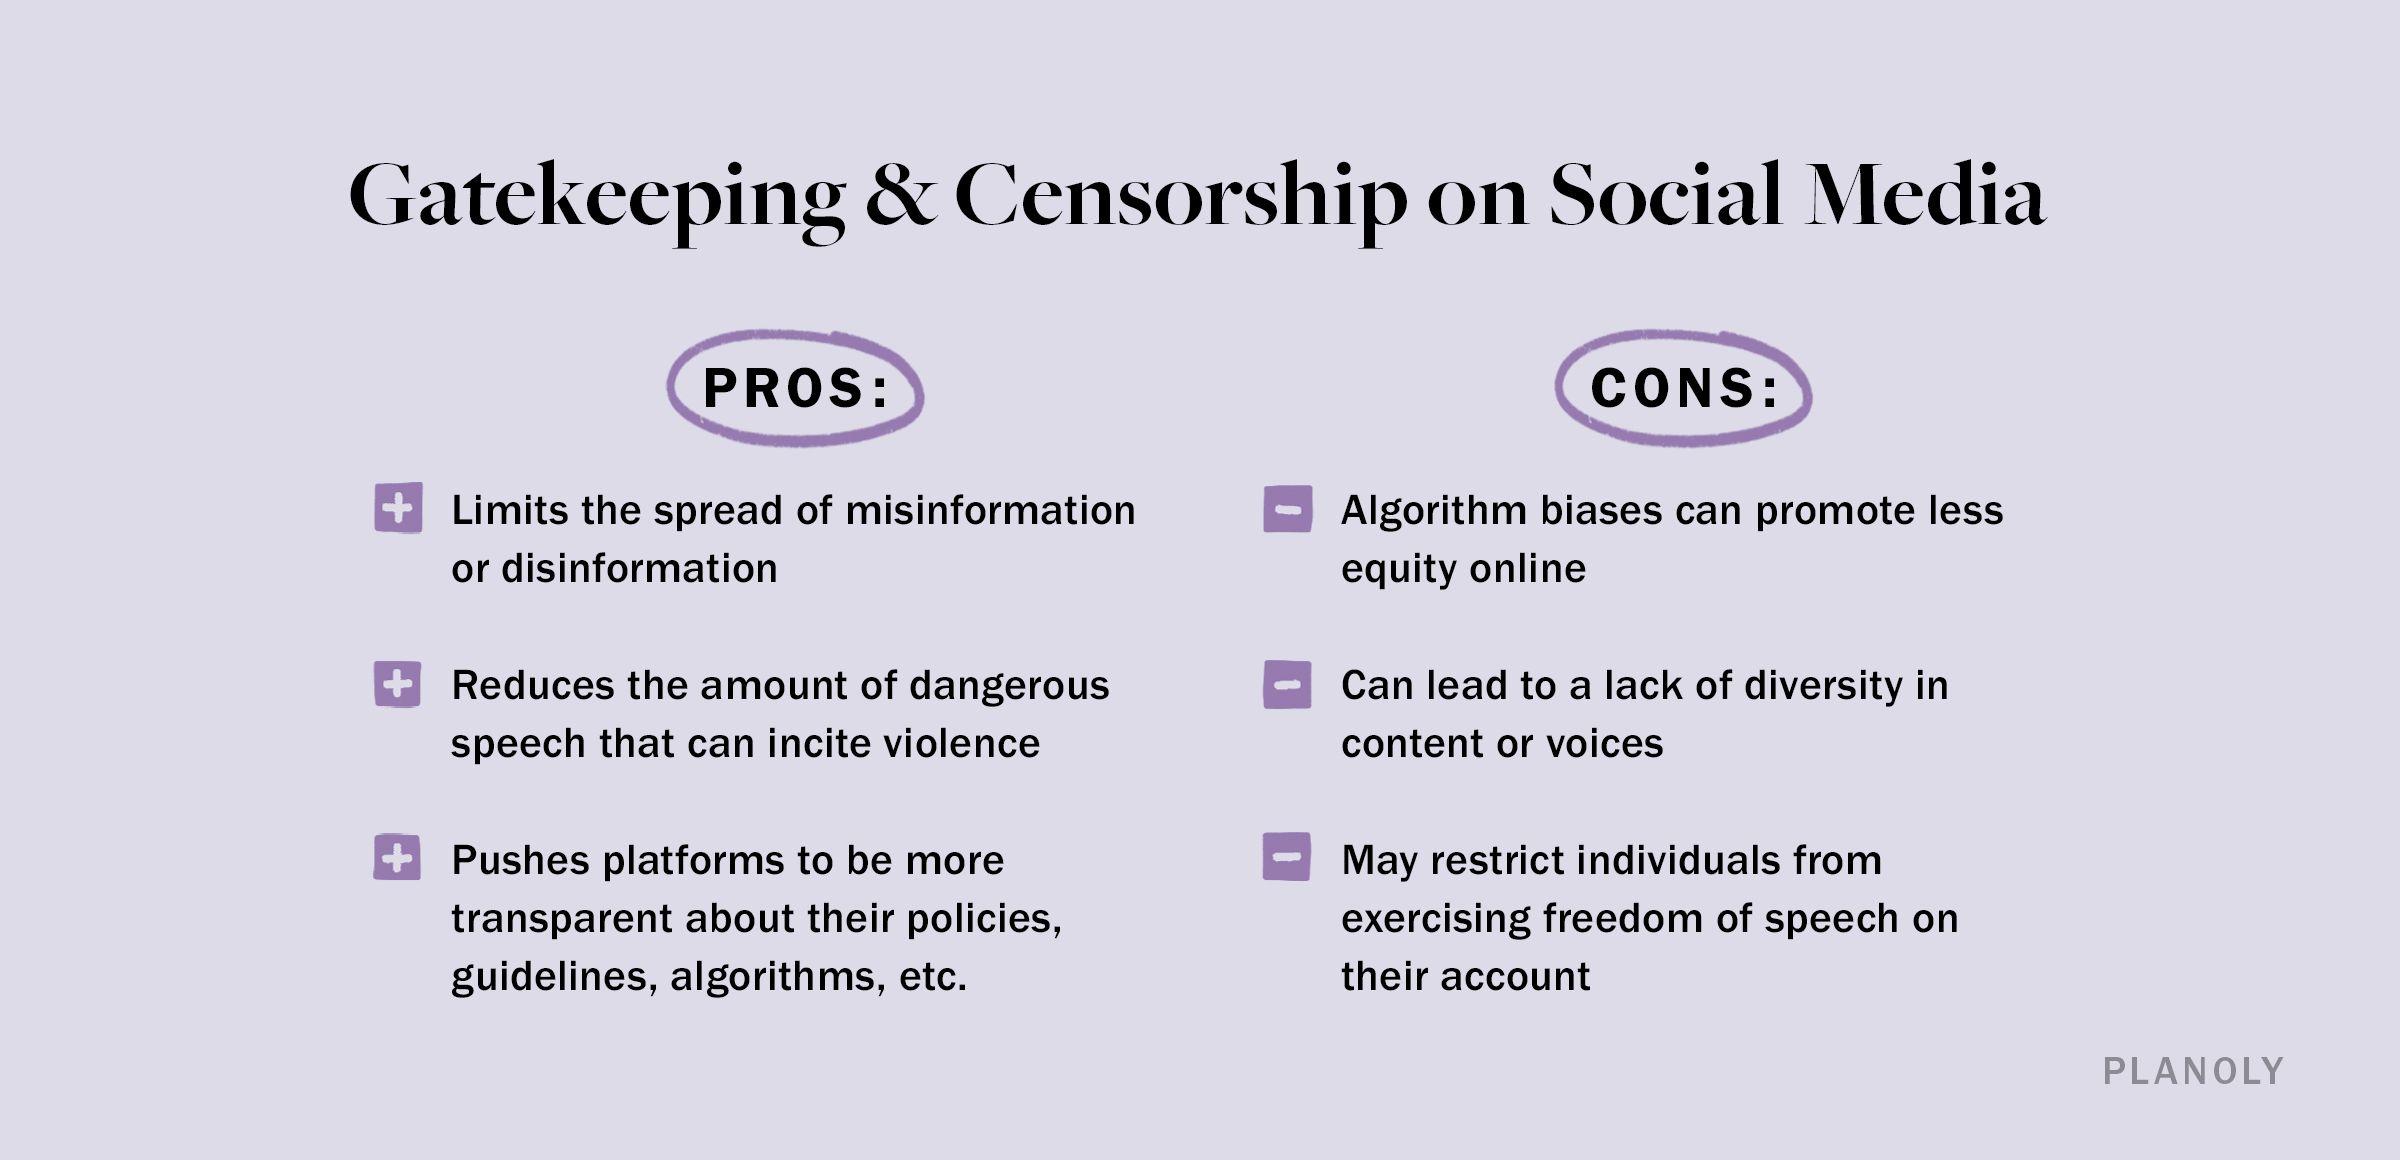 PLANOLY - Blog - Gatekeeping and Censorship in Social Media - Image 3